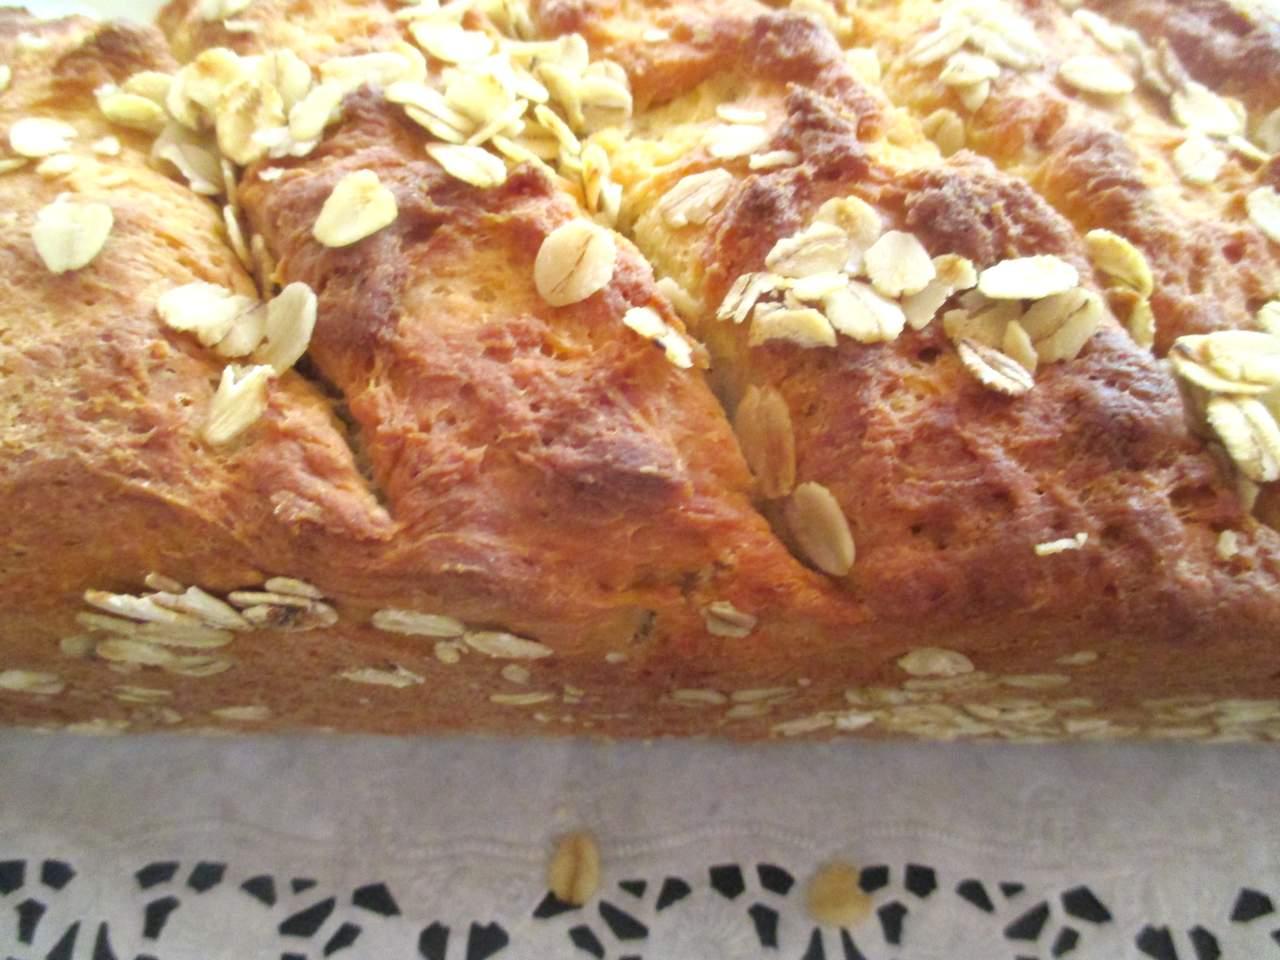 Brotrezept Dinkel Apfelmus Brot Mit Hefe Honig Quark